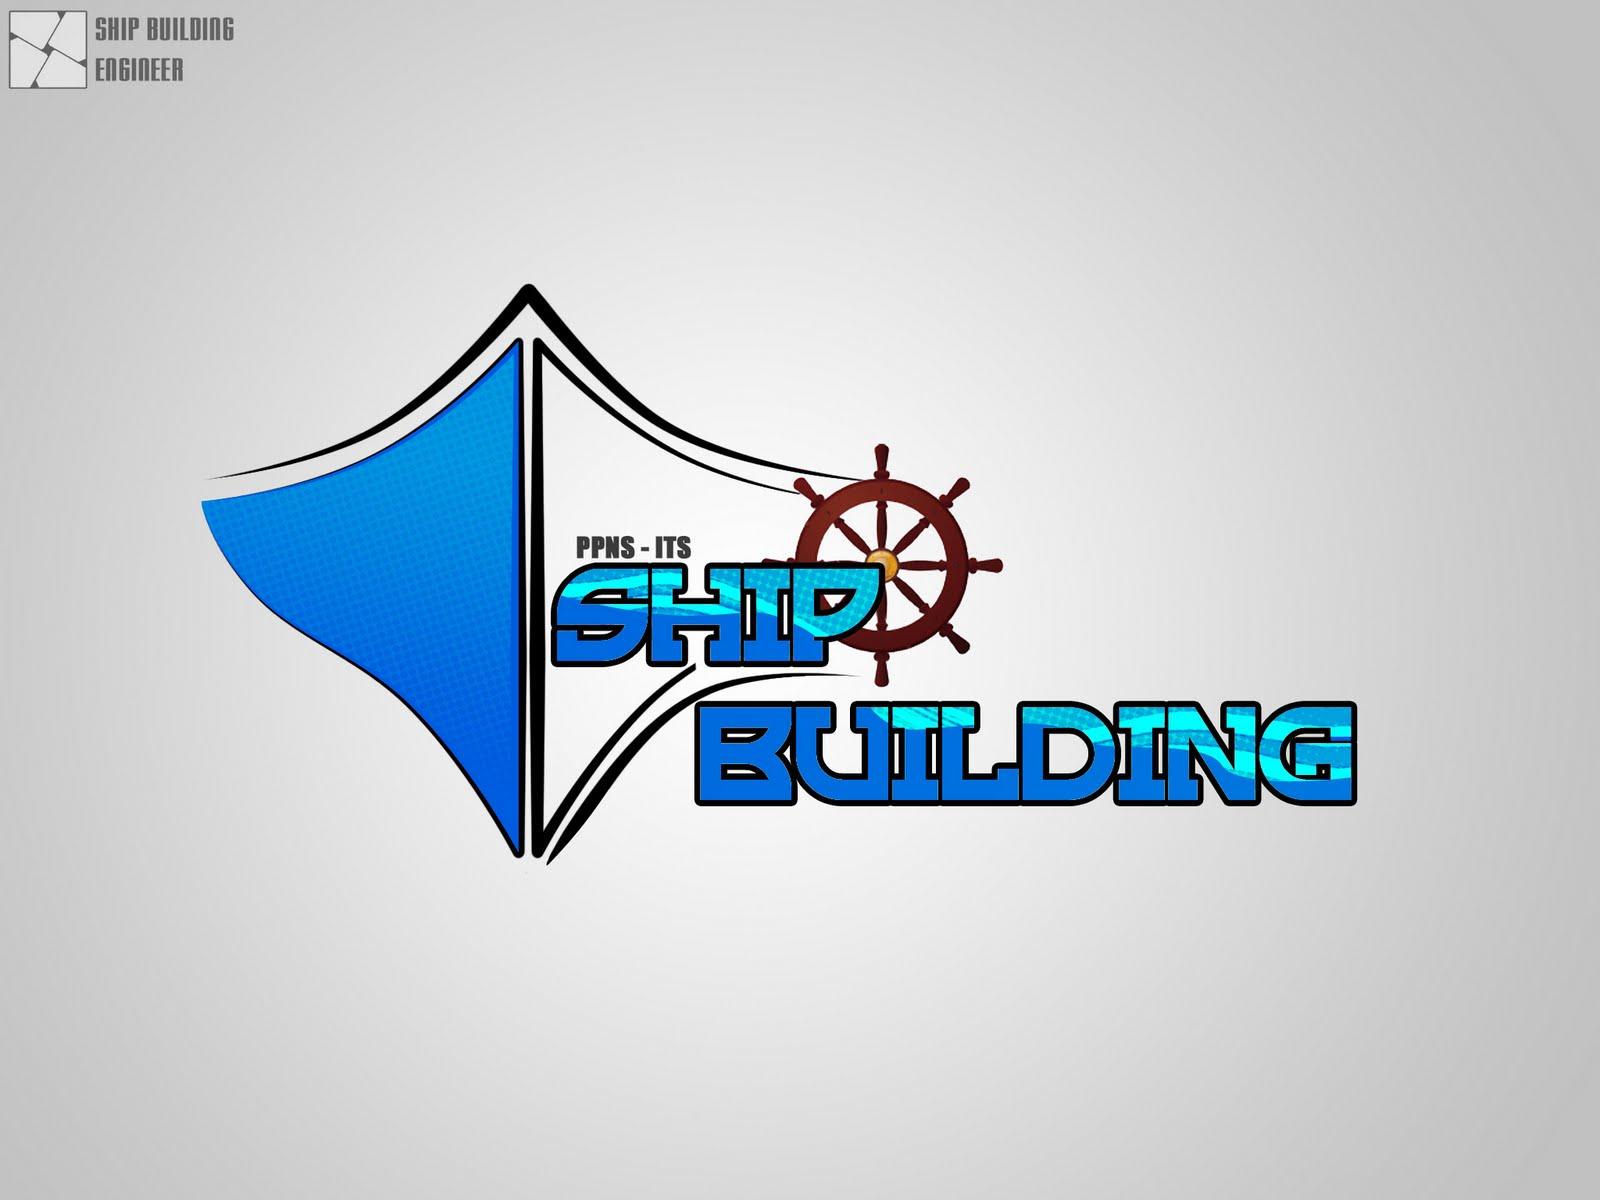 http://3.bp.blogspot.com/-1mF5kYtzy_I/TmnVZ1FE4-I/AAAAAAAABjI/ZE6AI6spUFs/s1600/Ship%2Bbuilding.jpg